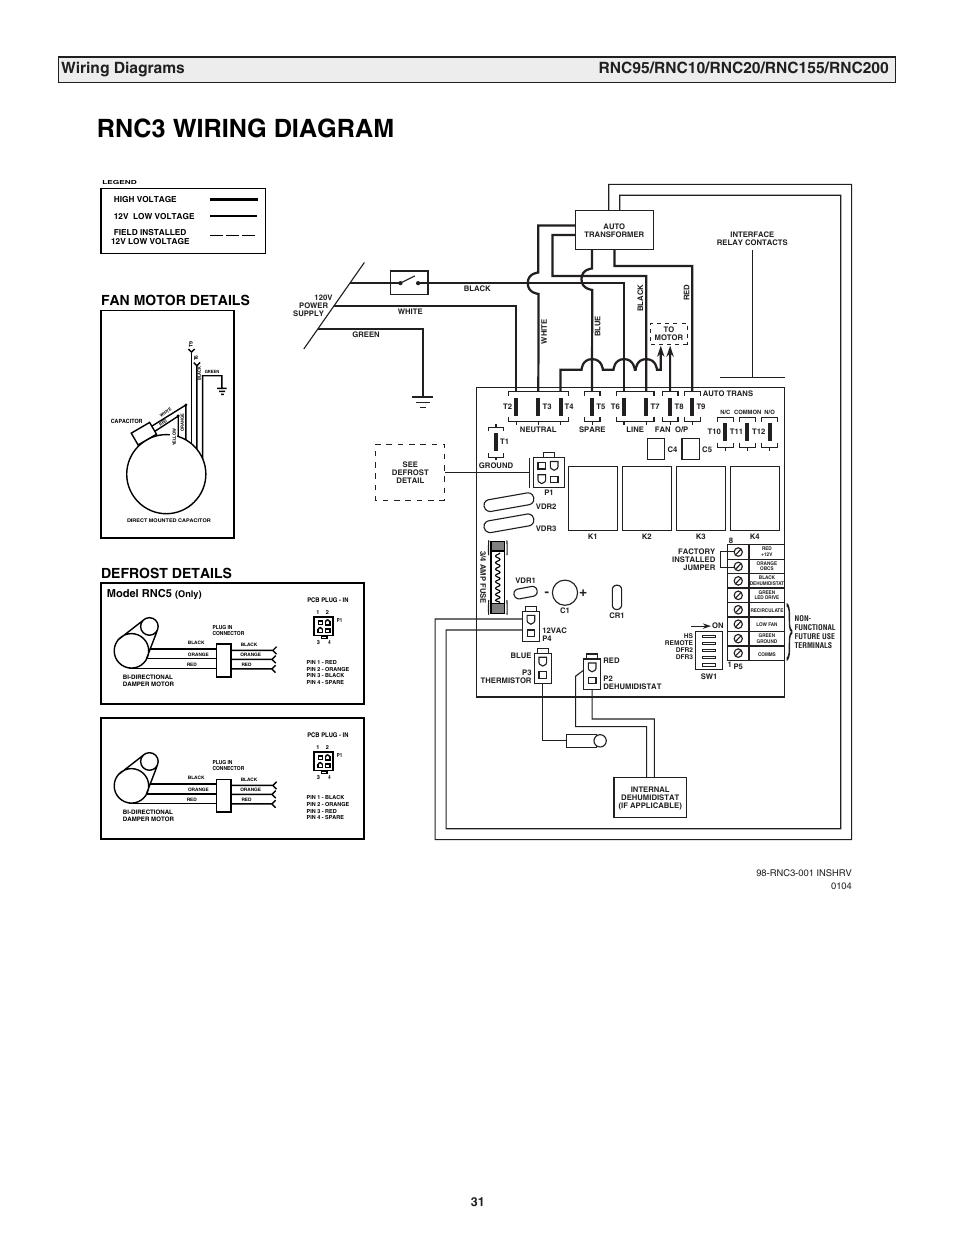 medium resolution of rnc3 wiring diagram fan motor details defrost details model rnc5 lifebreath rnc120d